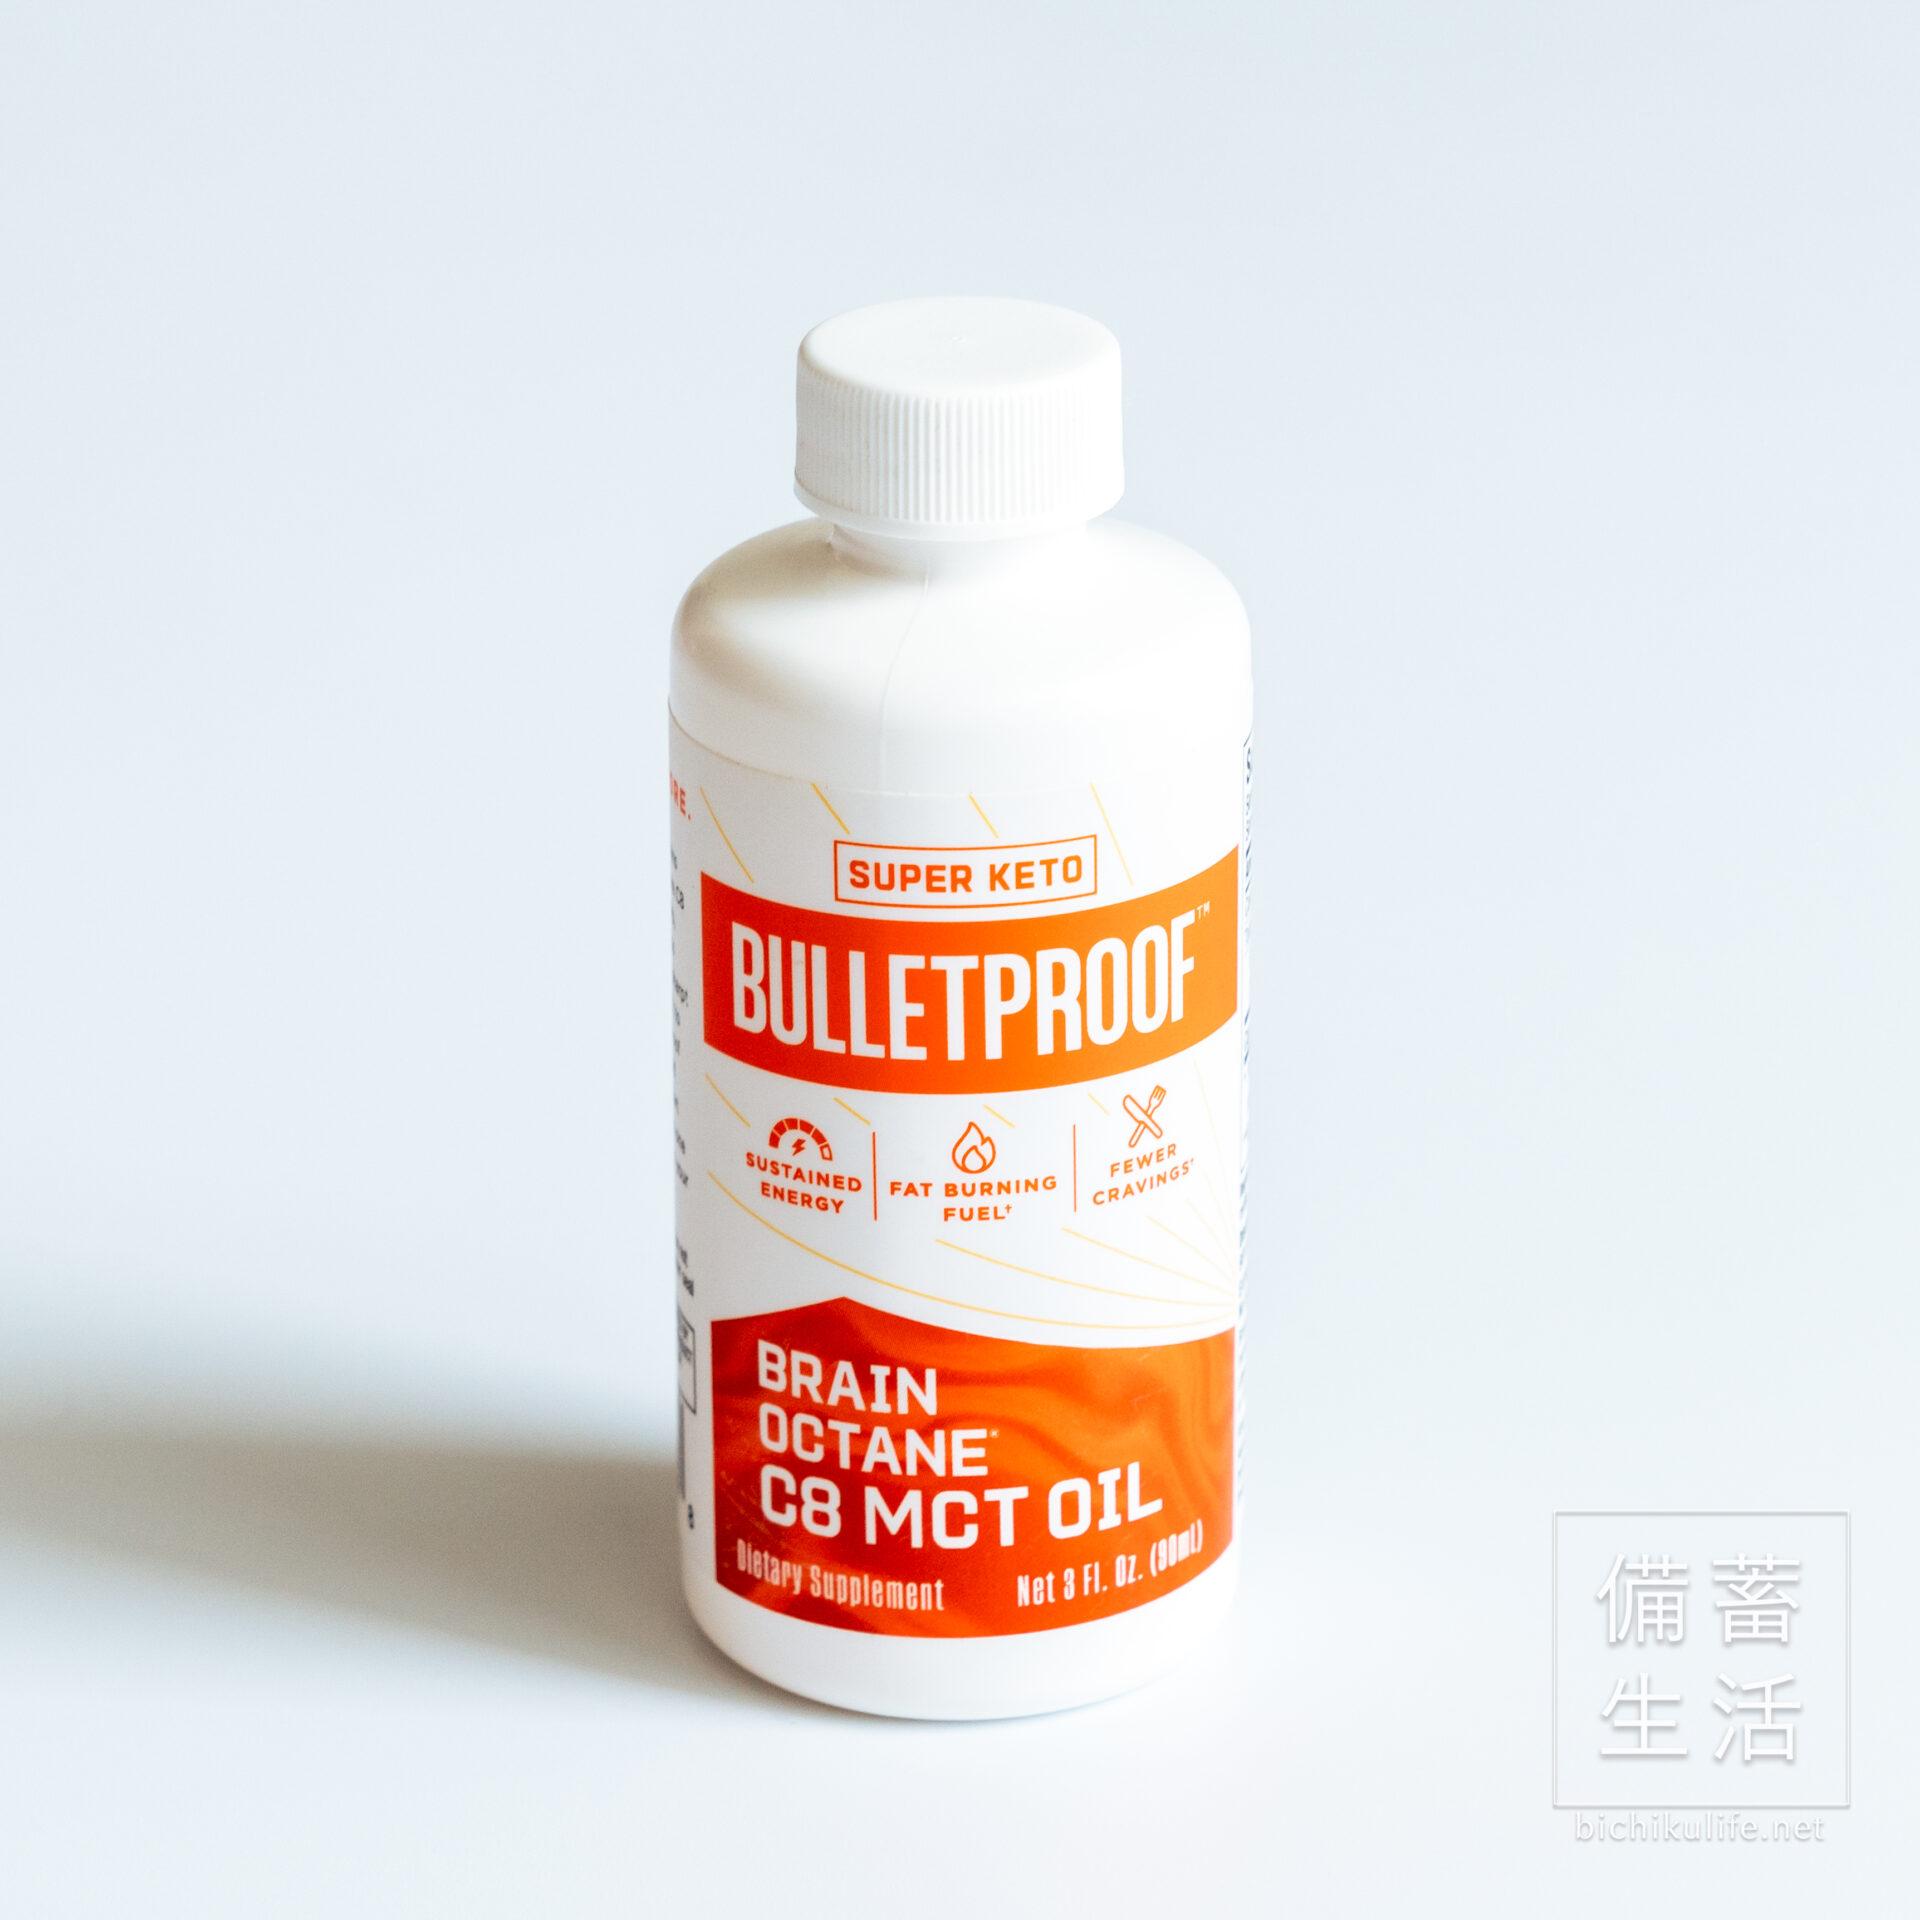 BulletproofのBRAIN OCTANE C8 MCTオイル